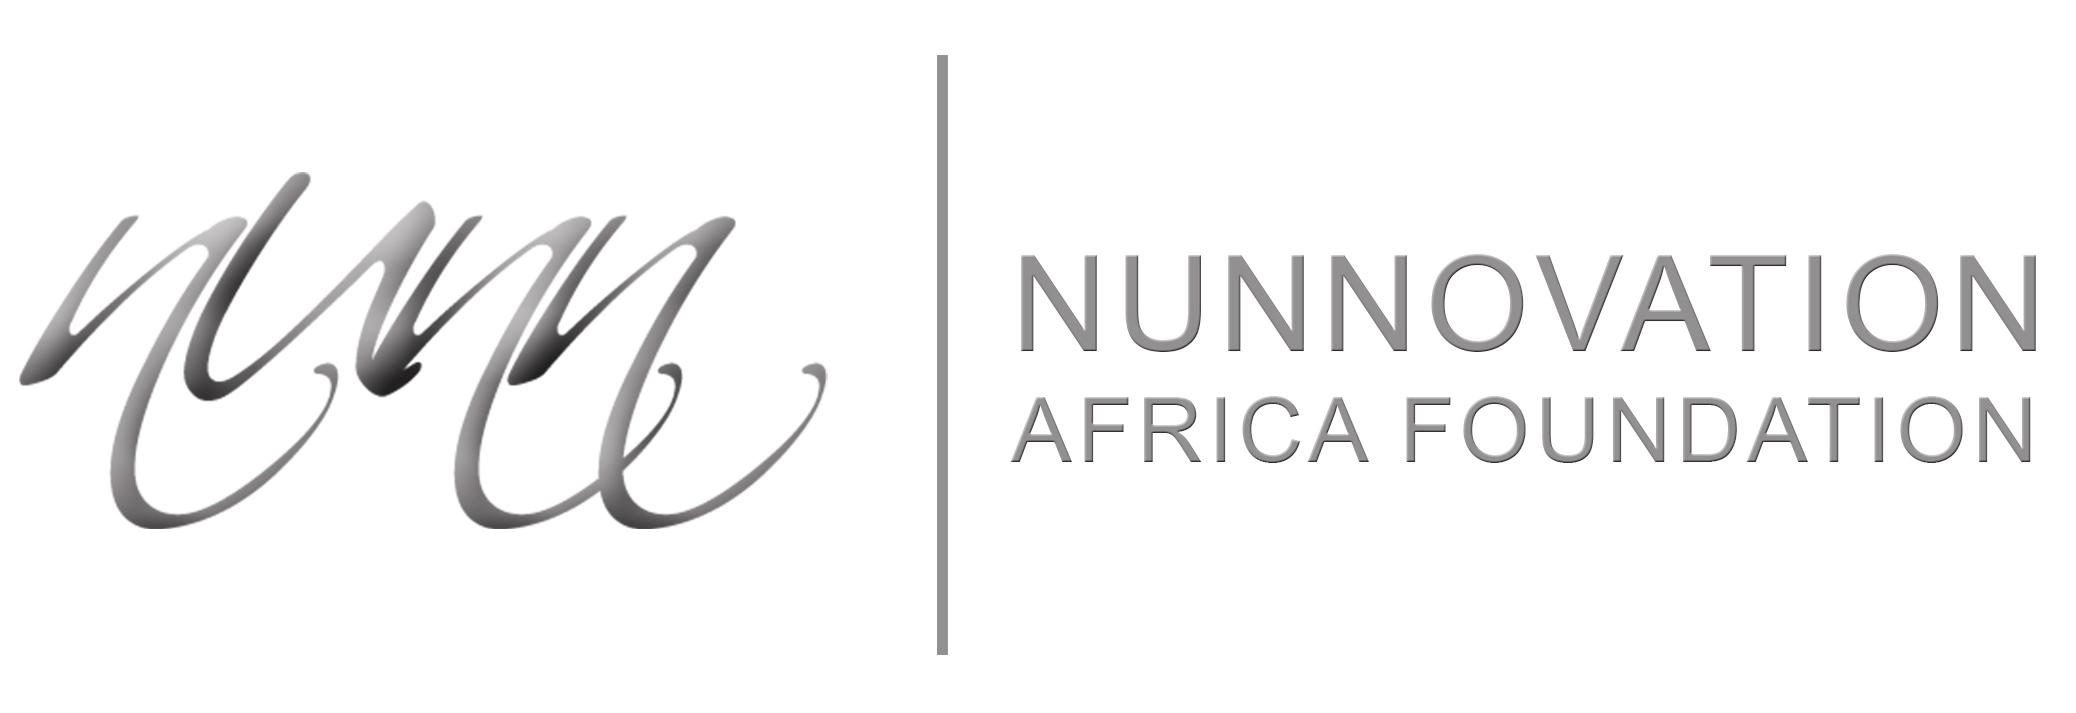 Nunnovation Africa Foundation (NAF)